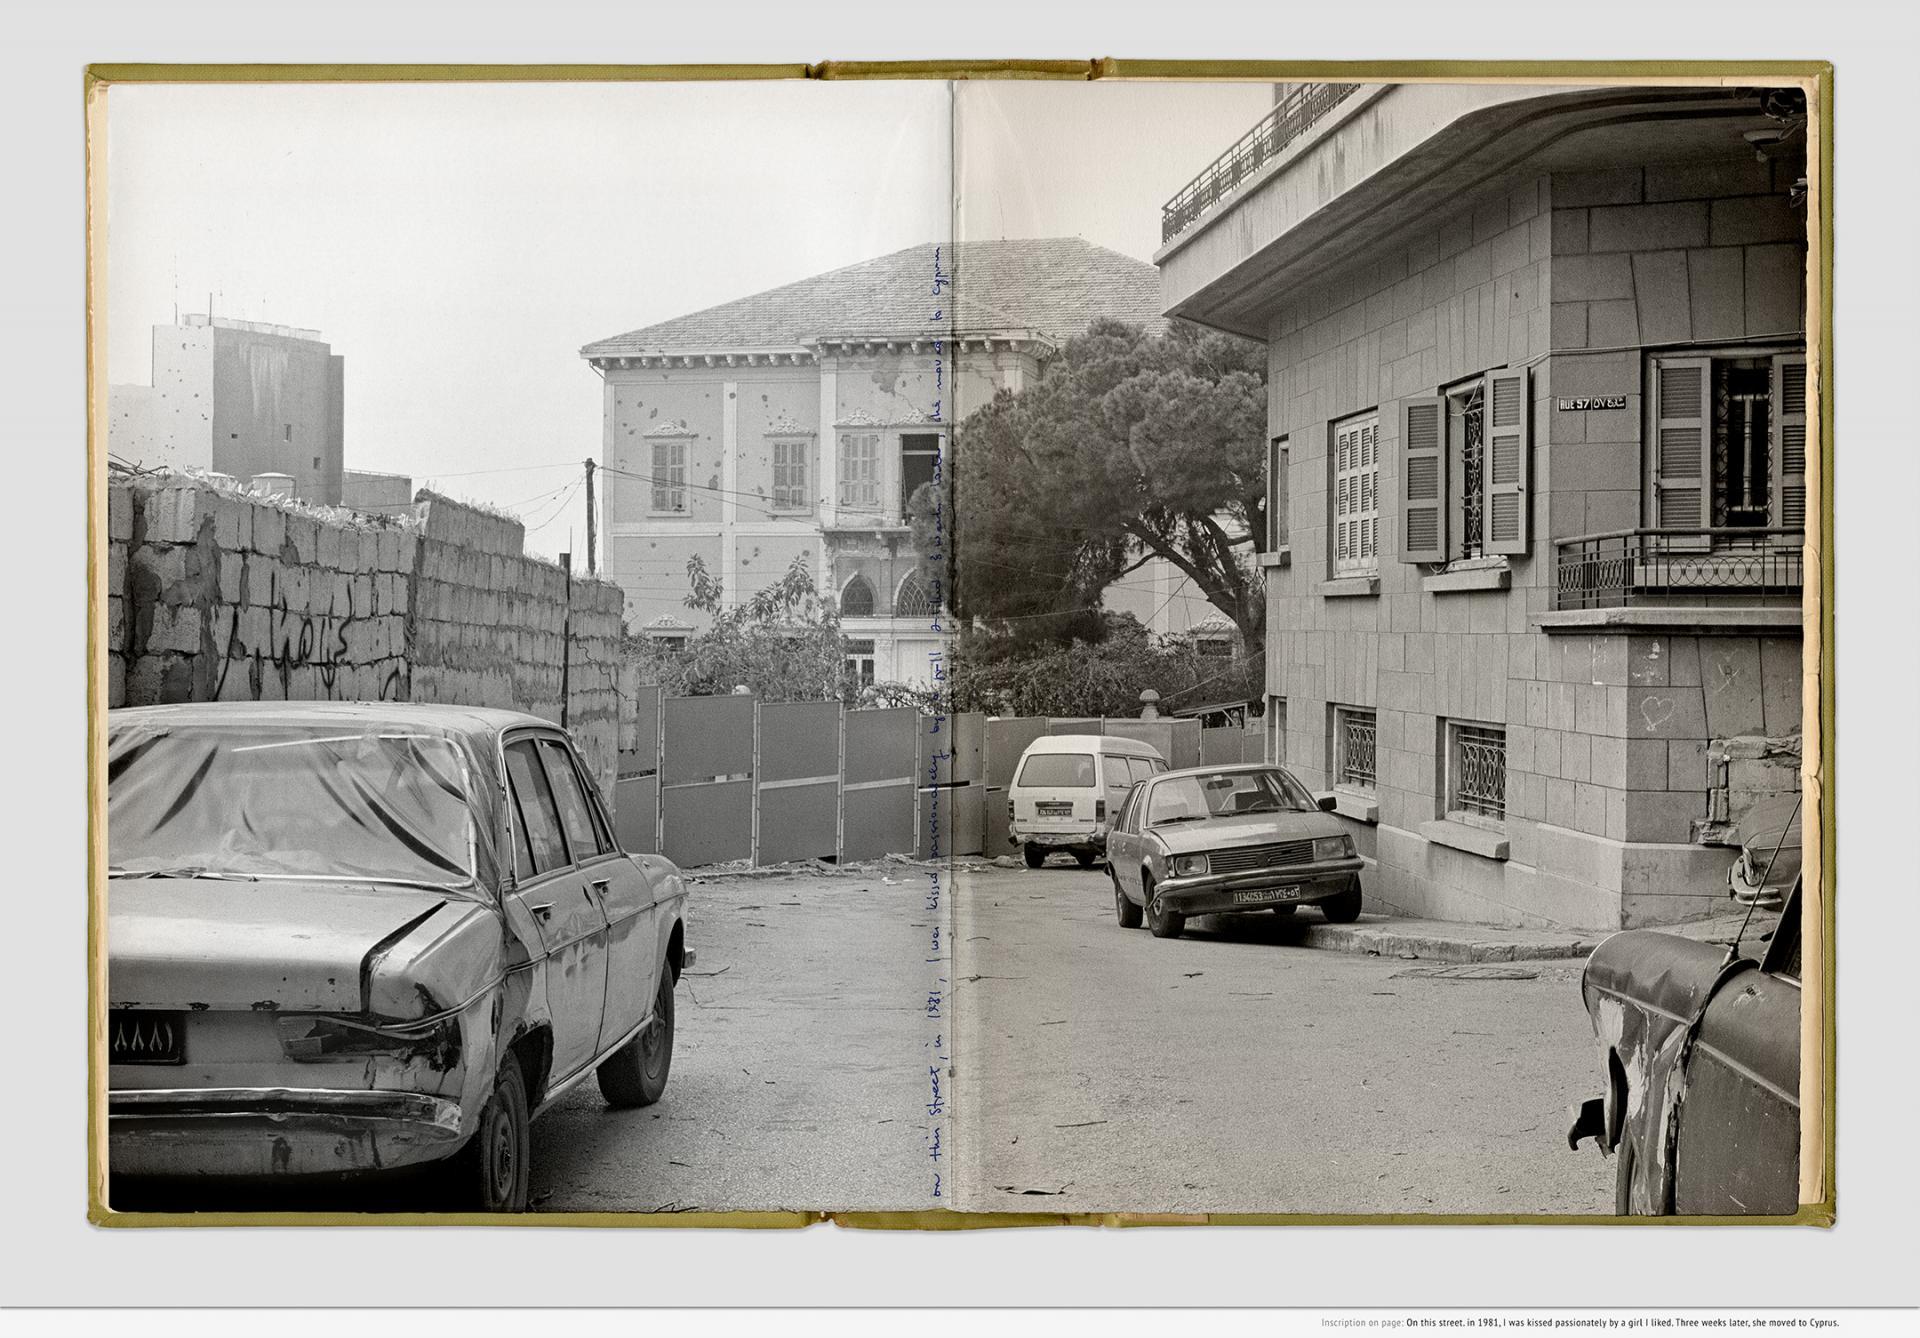 Sweet Talk. Commissions (Beirut) _ 1987.002, 1987-2019, inkjet print, 54.3 x 76.3 x 3.5cm, framed